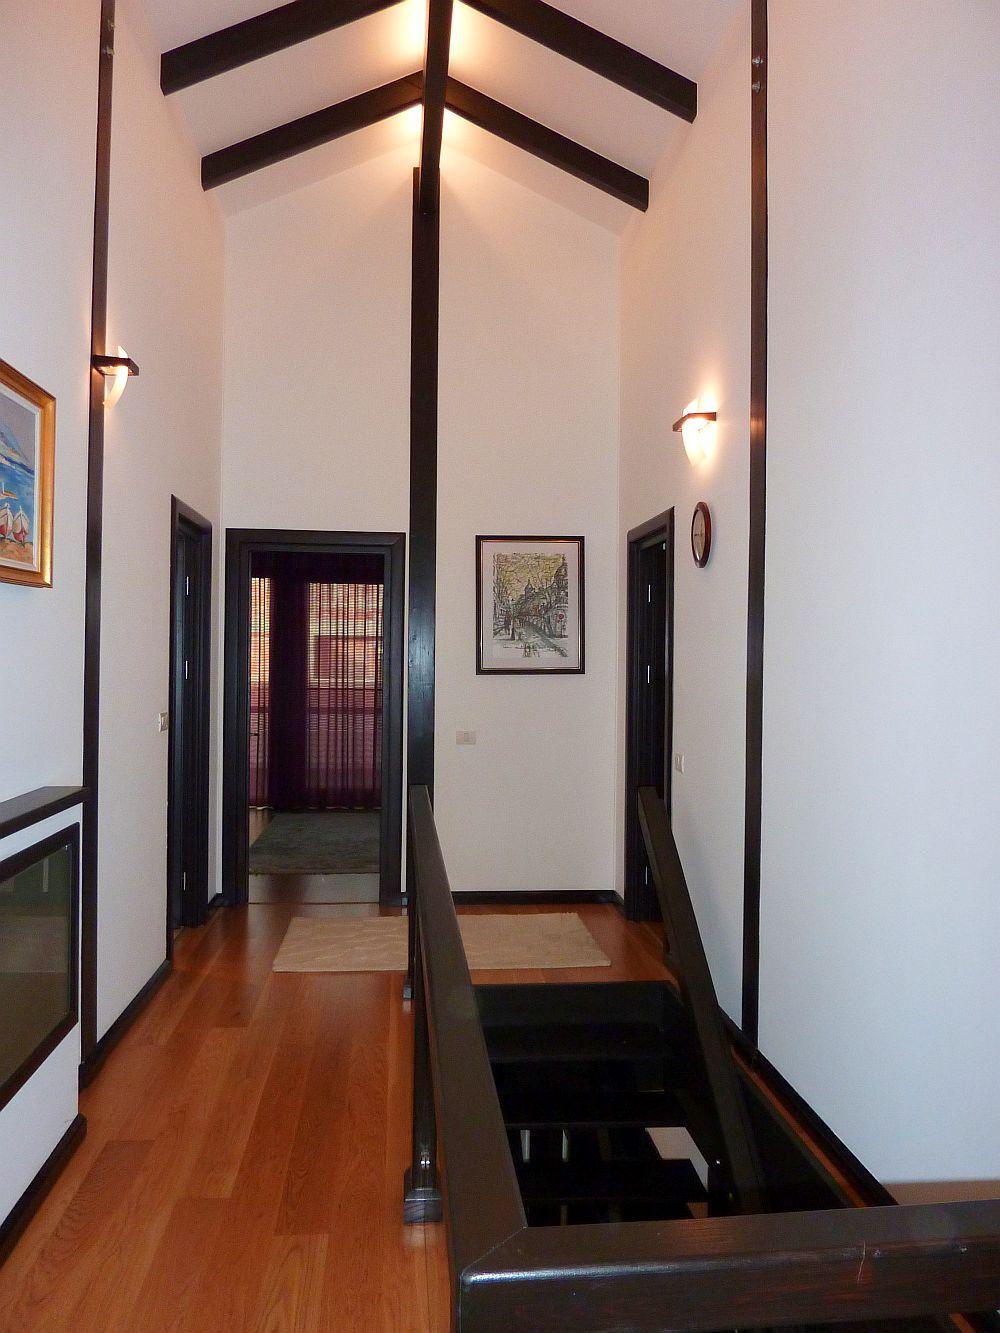 adelaparvu.com despre casa modulara pe sistem de barne, arhitectura Soleta (33)